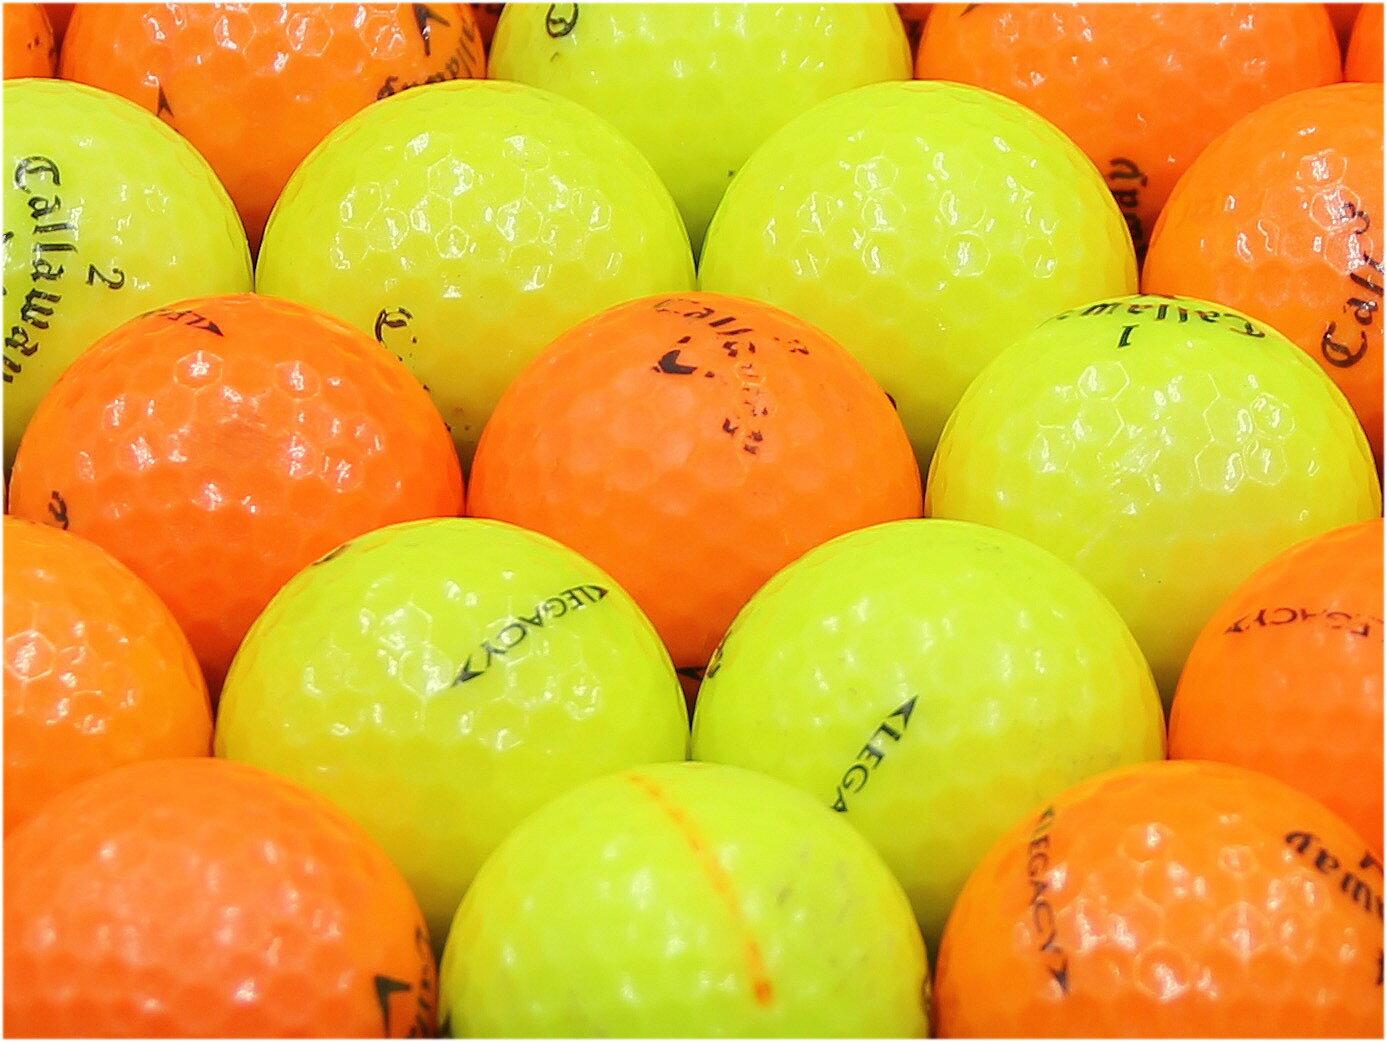 【Bランク】キャロウェイ LEGACY 2012年モデル カラーボール混合 1個 【あす楽】【ロストボール】【中古】